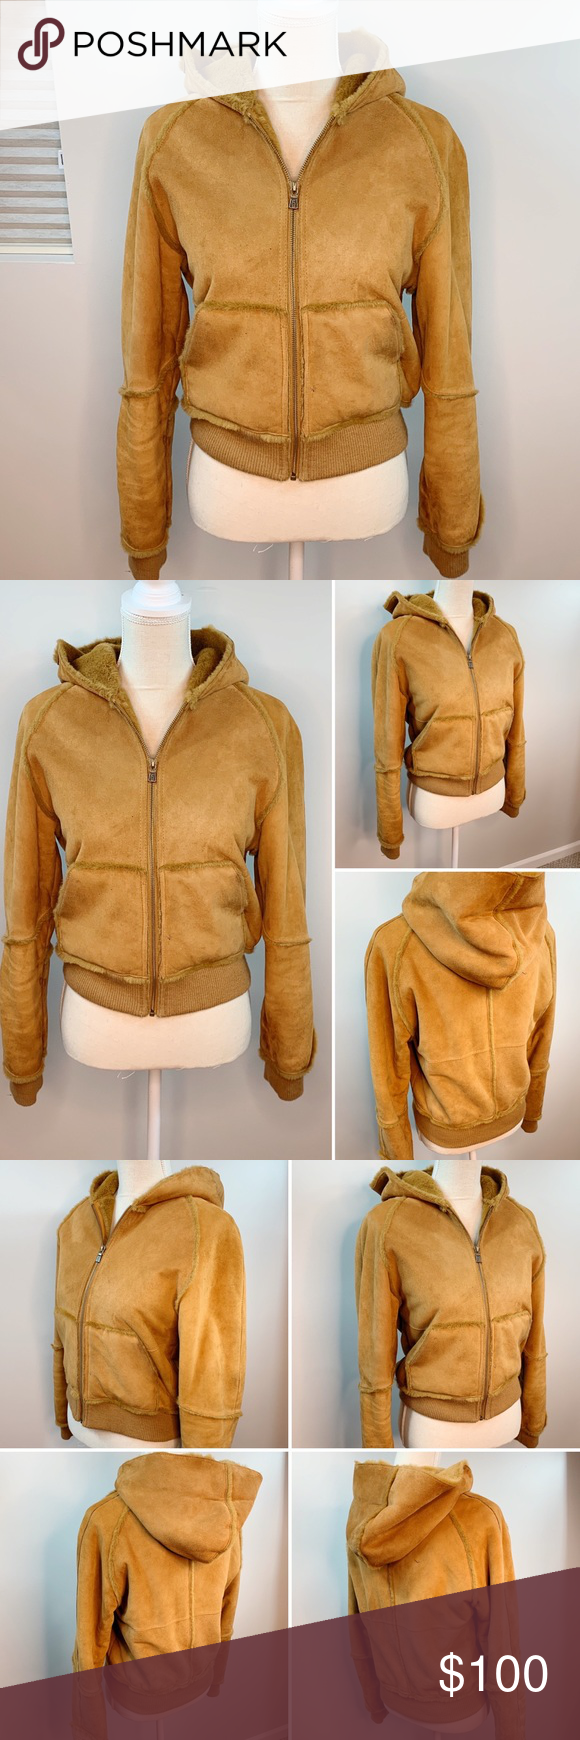 UGG Genuine Suede Leather Hooded Bomber Jacket Hooded